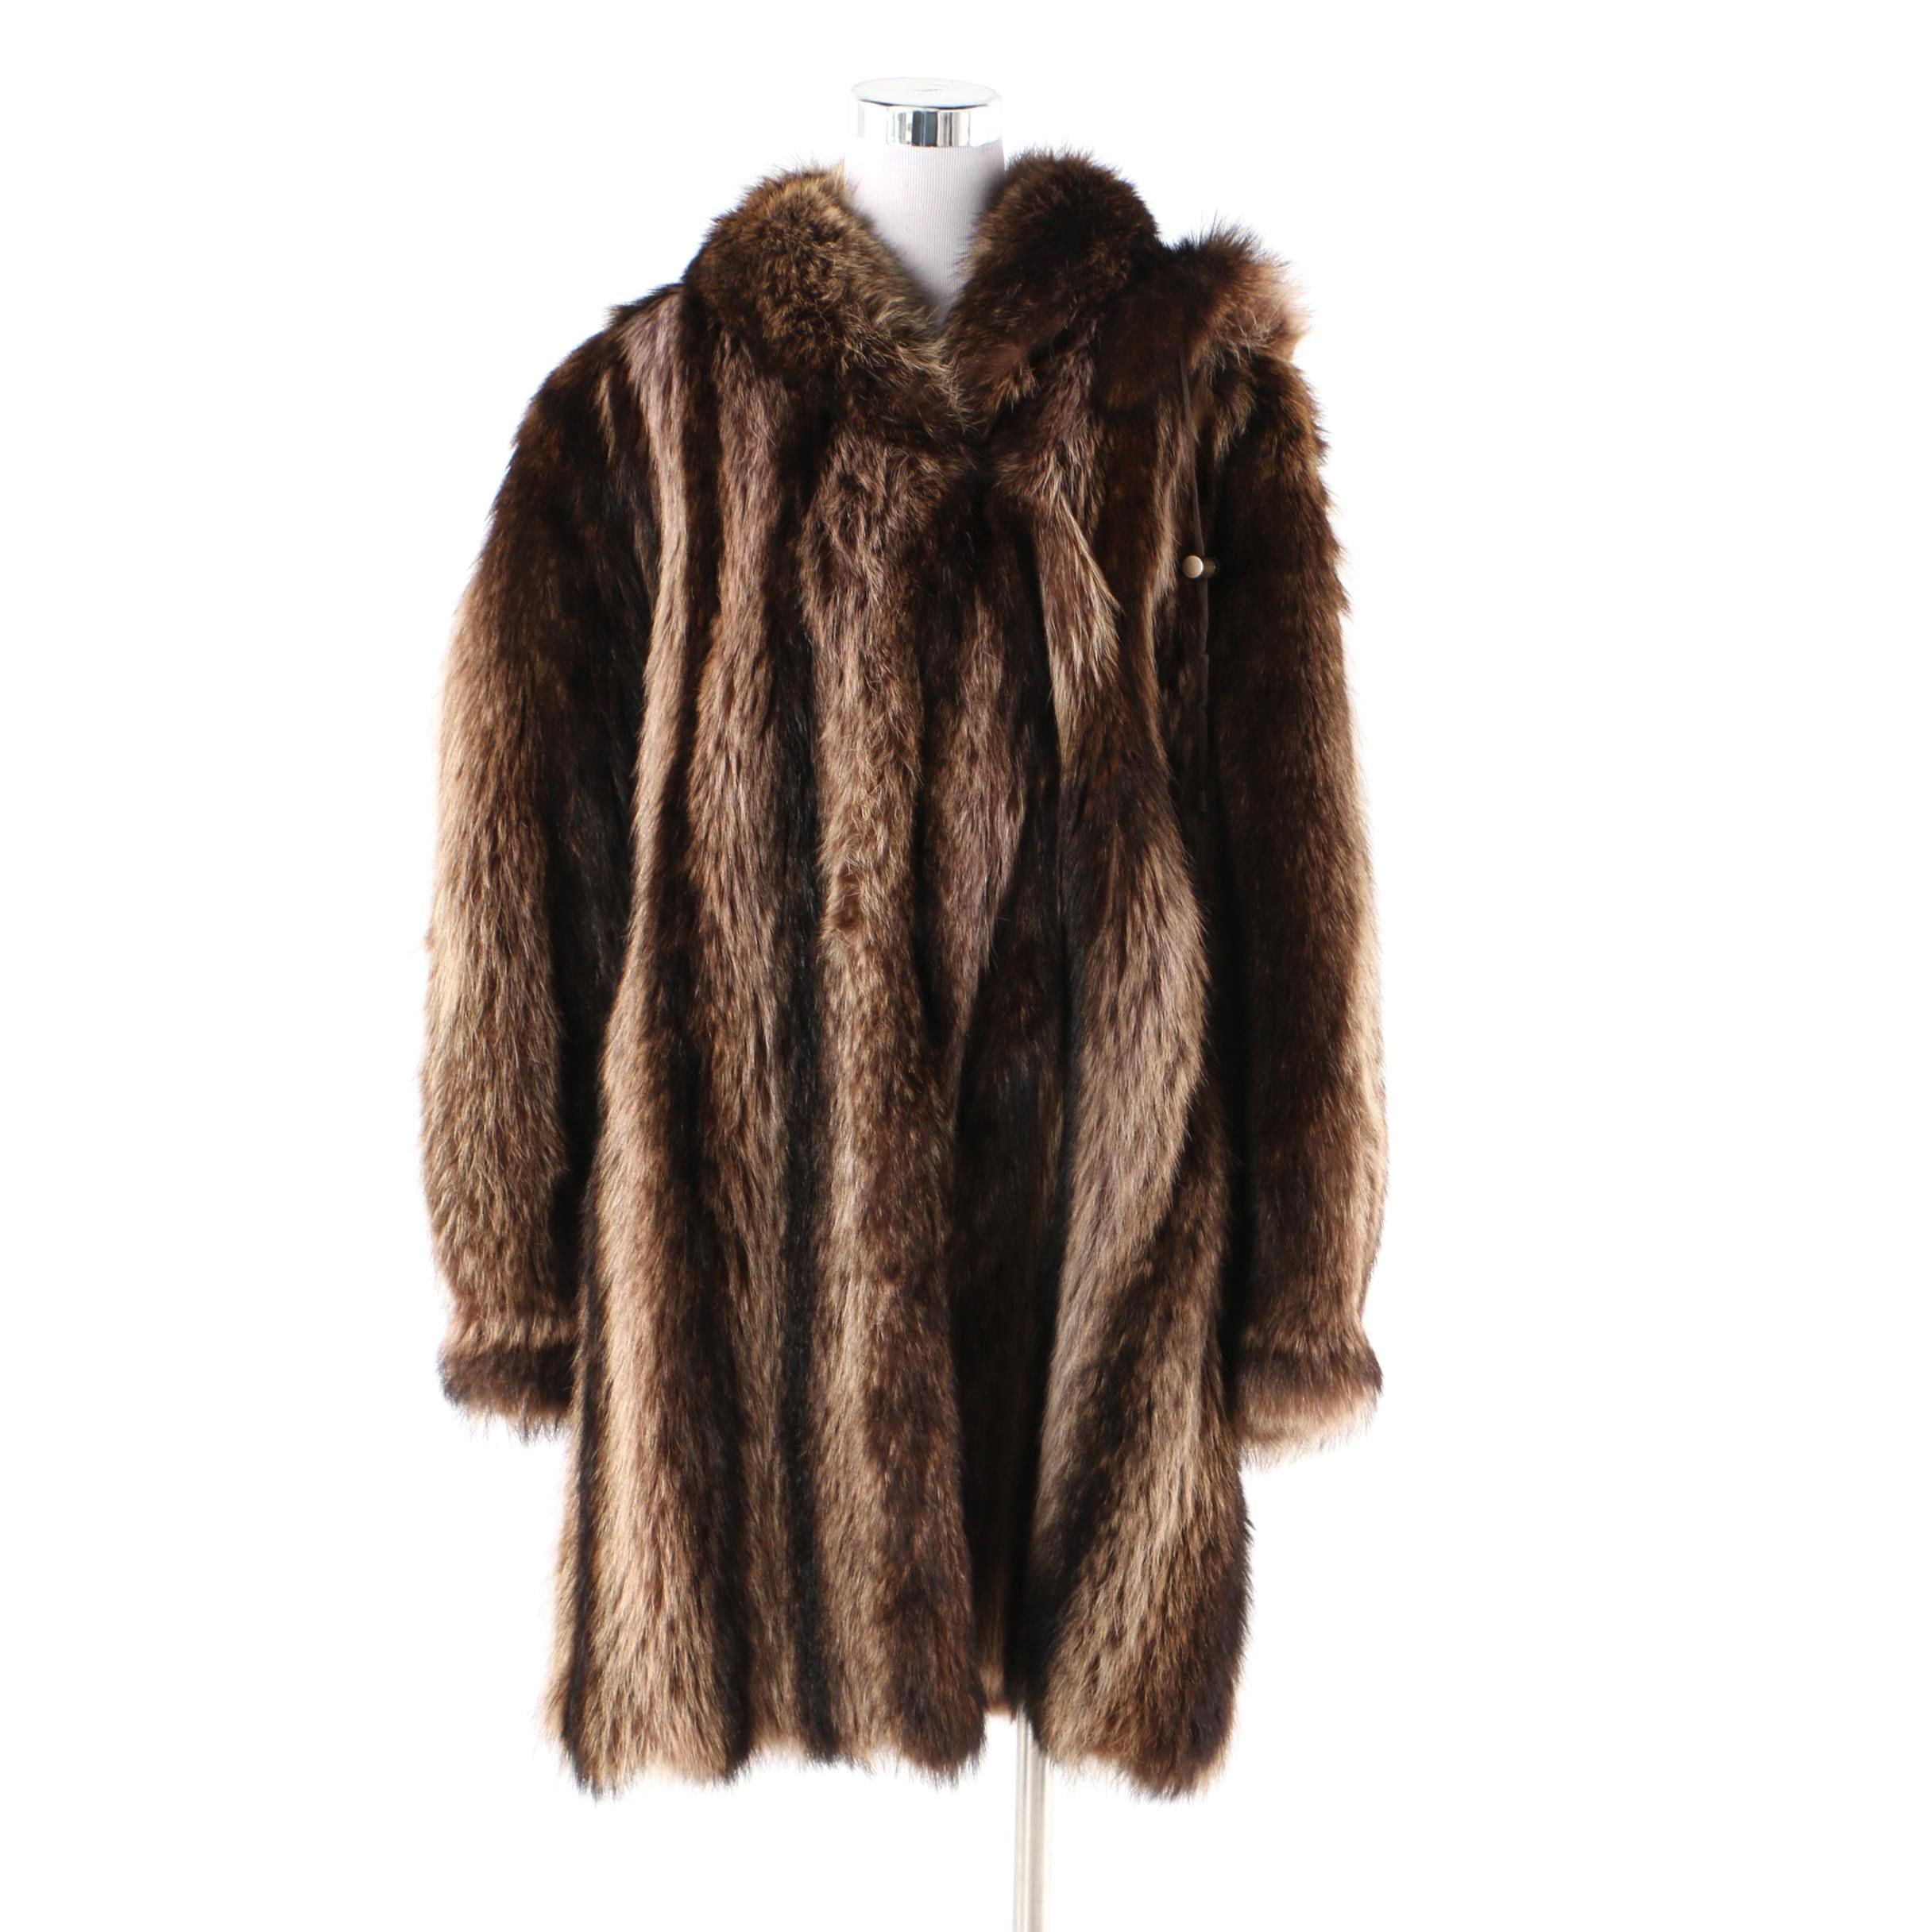 Women's Mysels Furs Hooded Raccoon Fur Coat